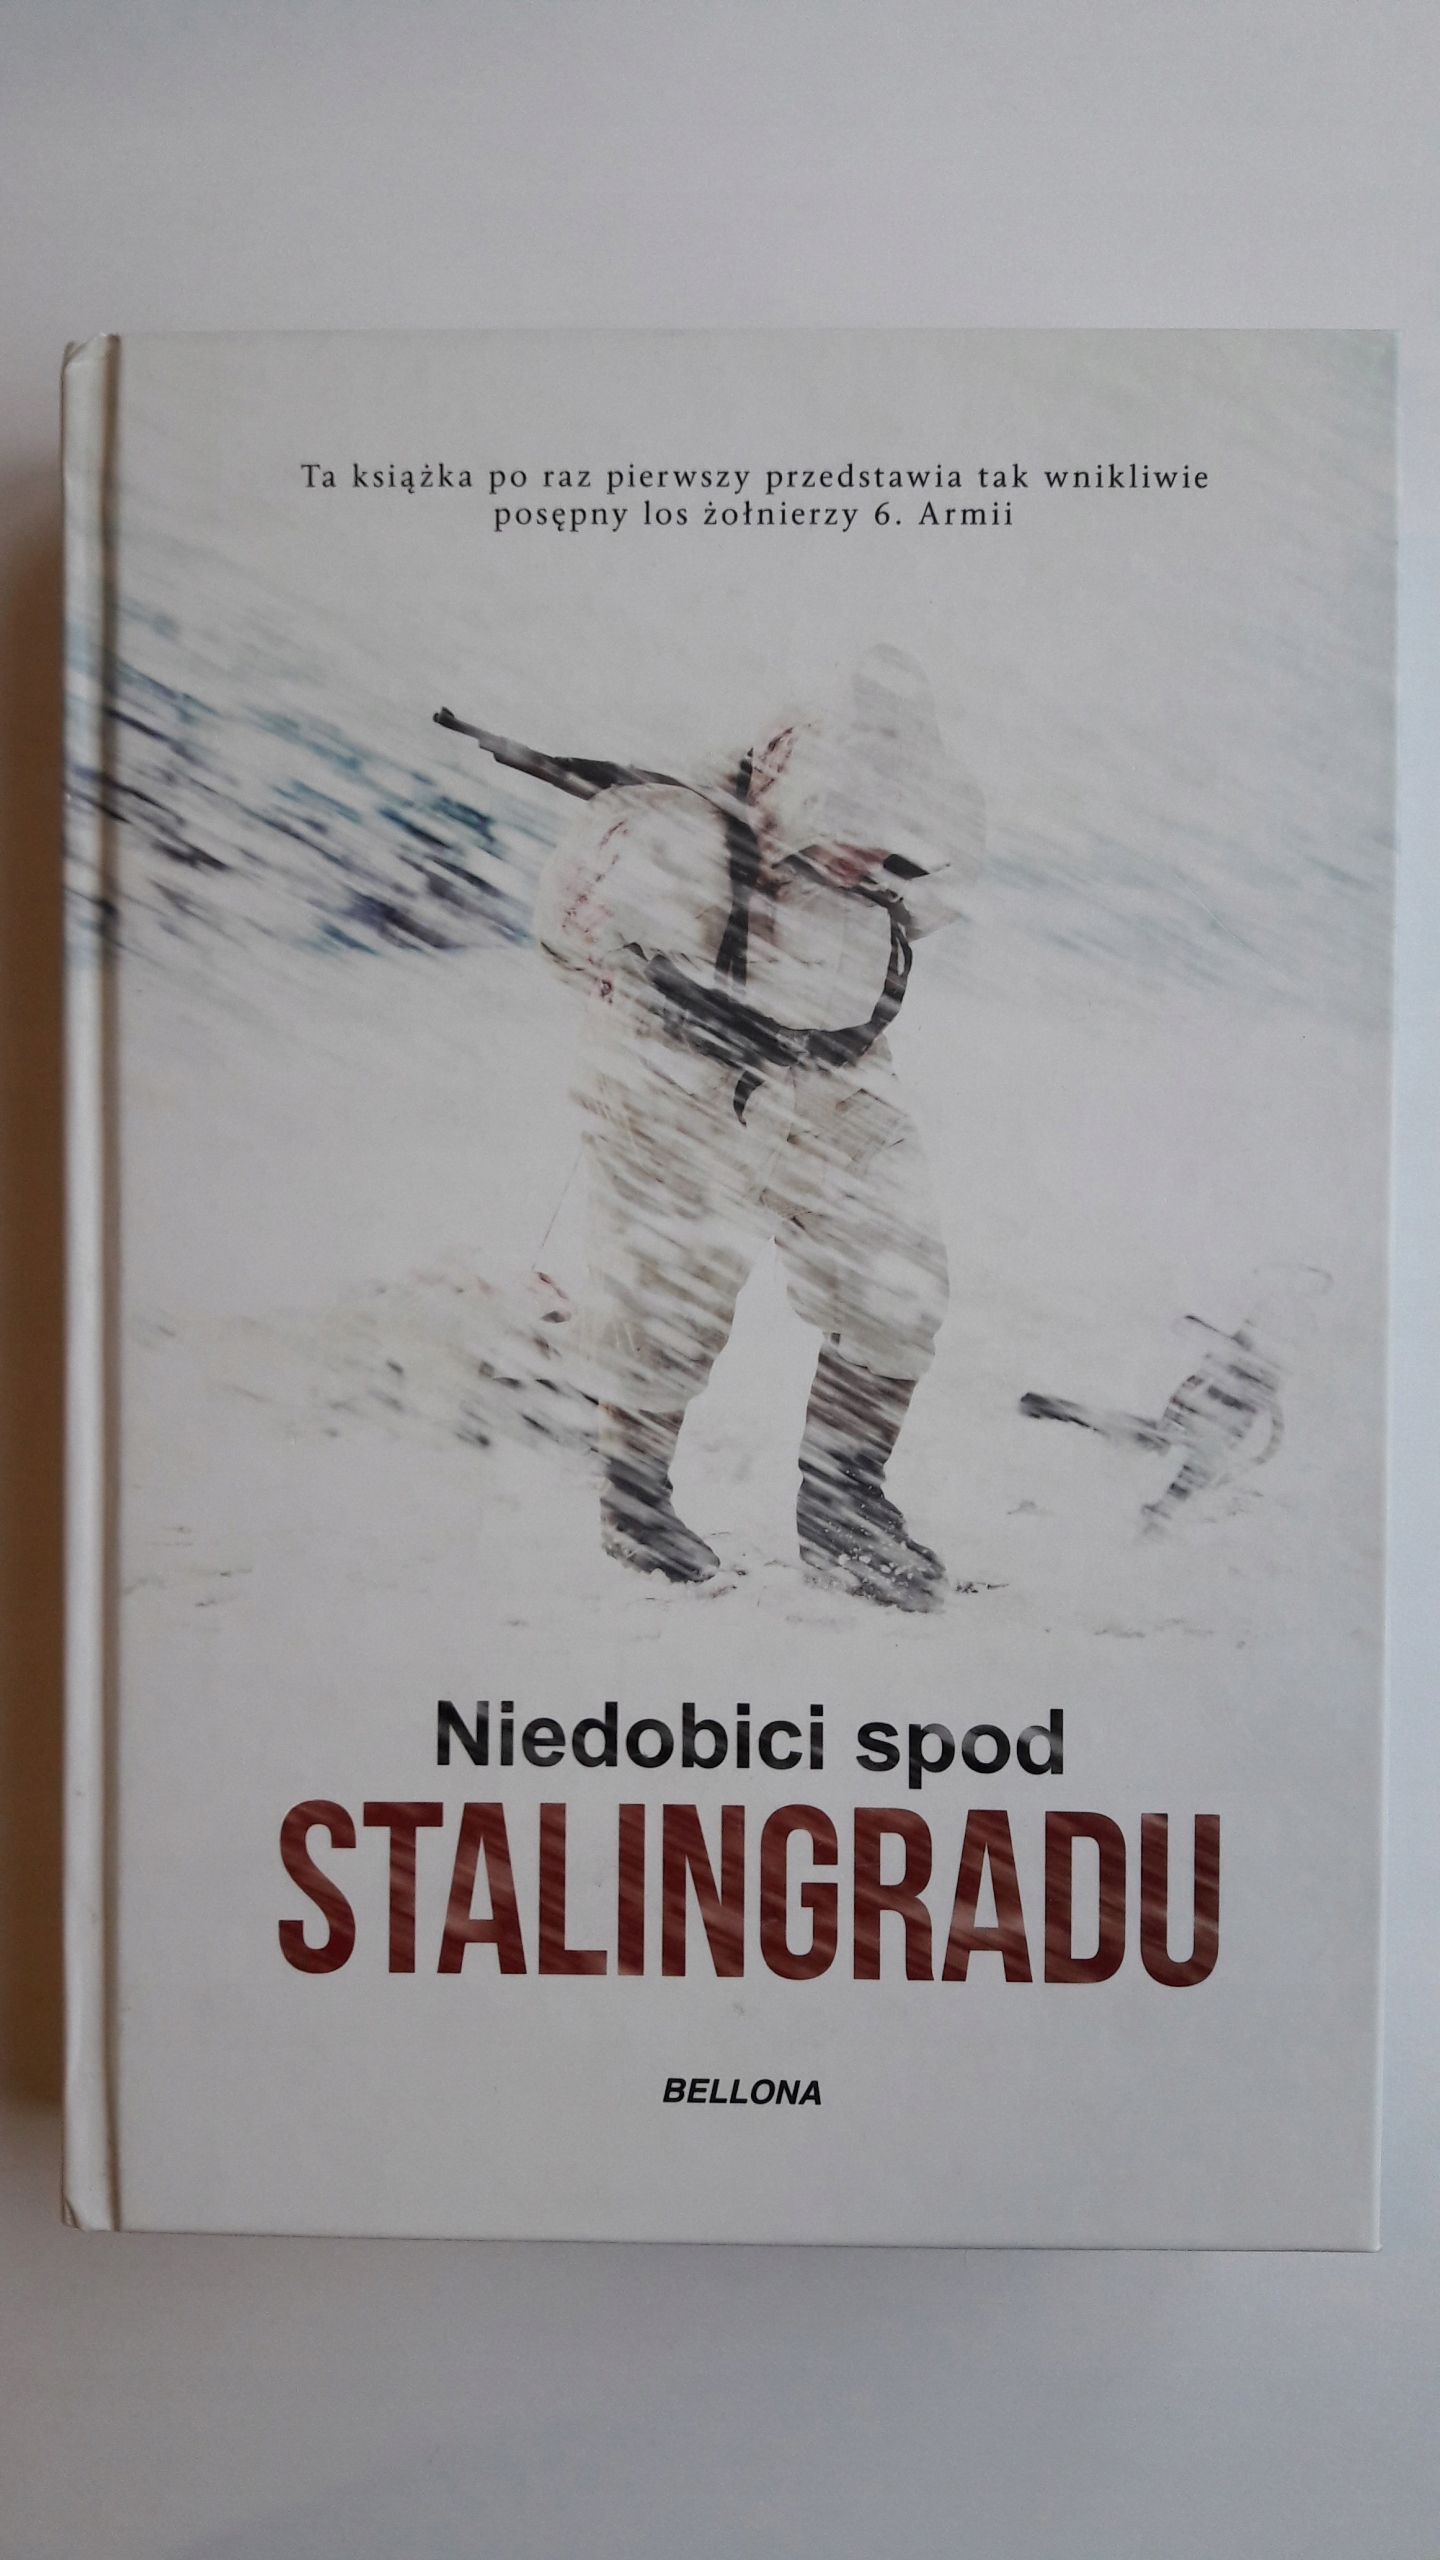 NIEDOBICI SPOD STALINGRADU - Reinhold Busch